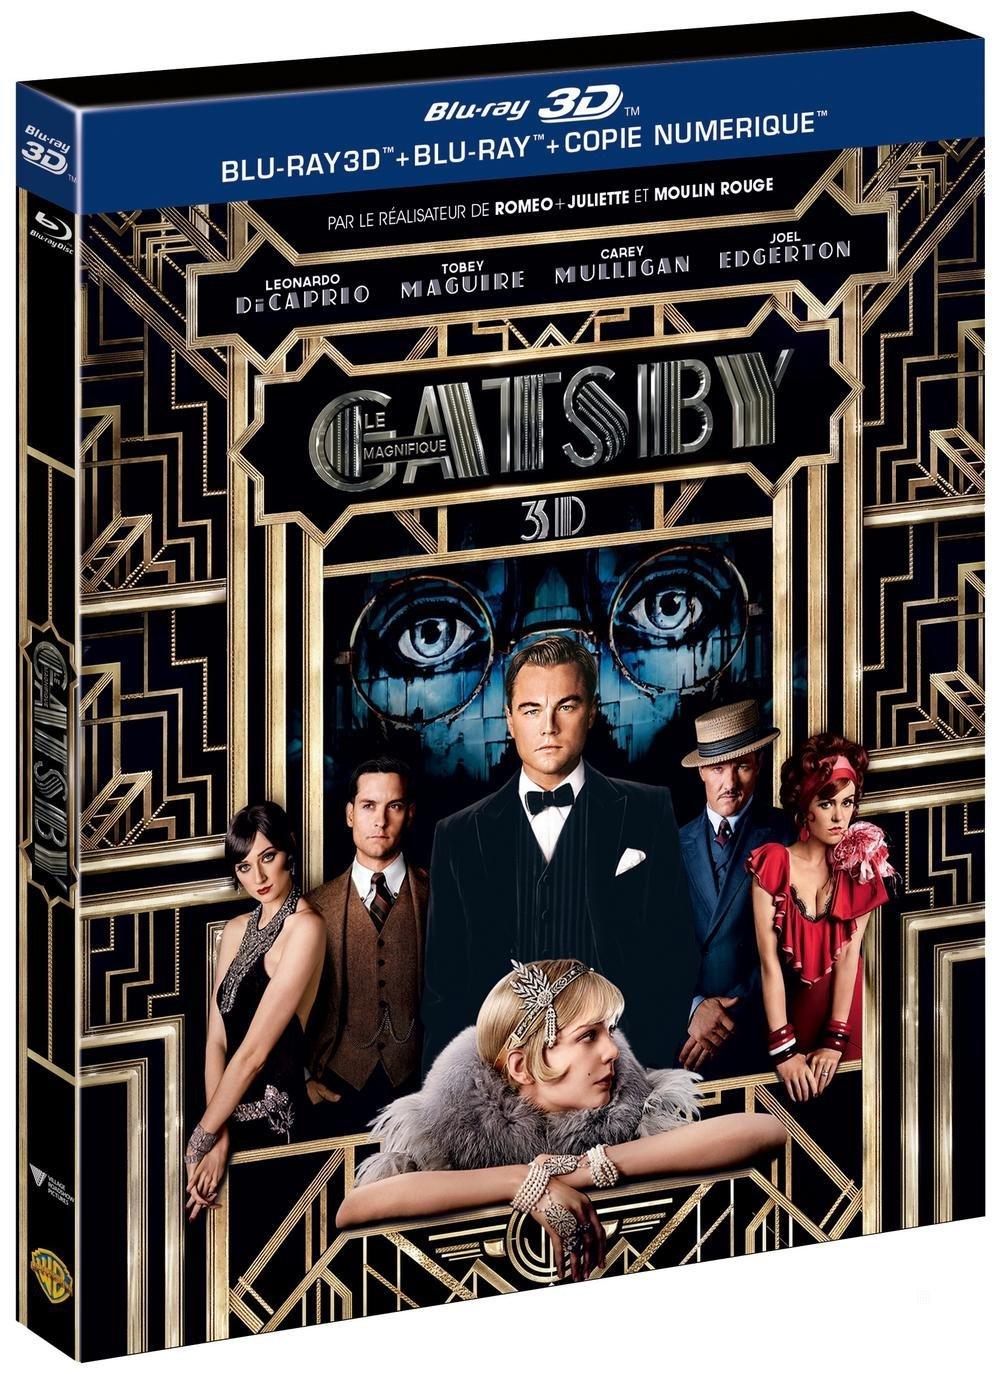 Gatsby le magnifique - Combo Blu-ray + Blu-ray 3D + Blu-ray + Copie digitale]